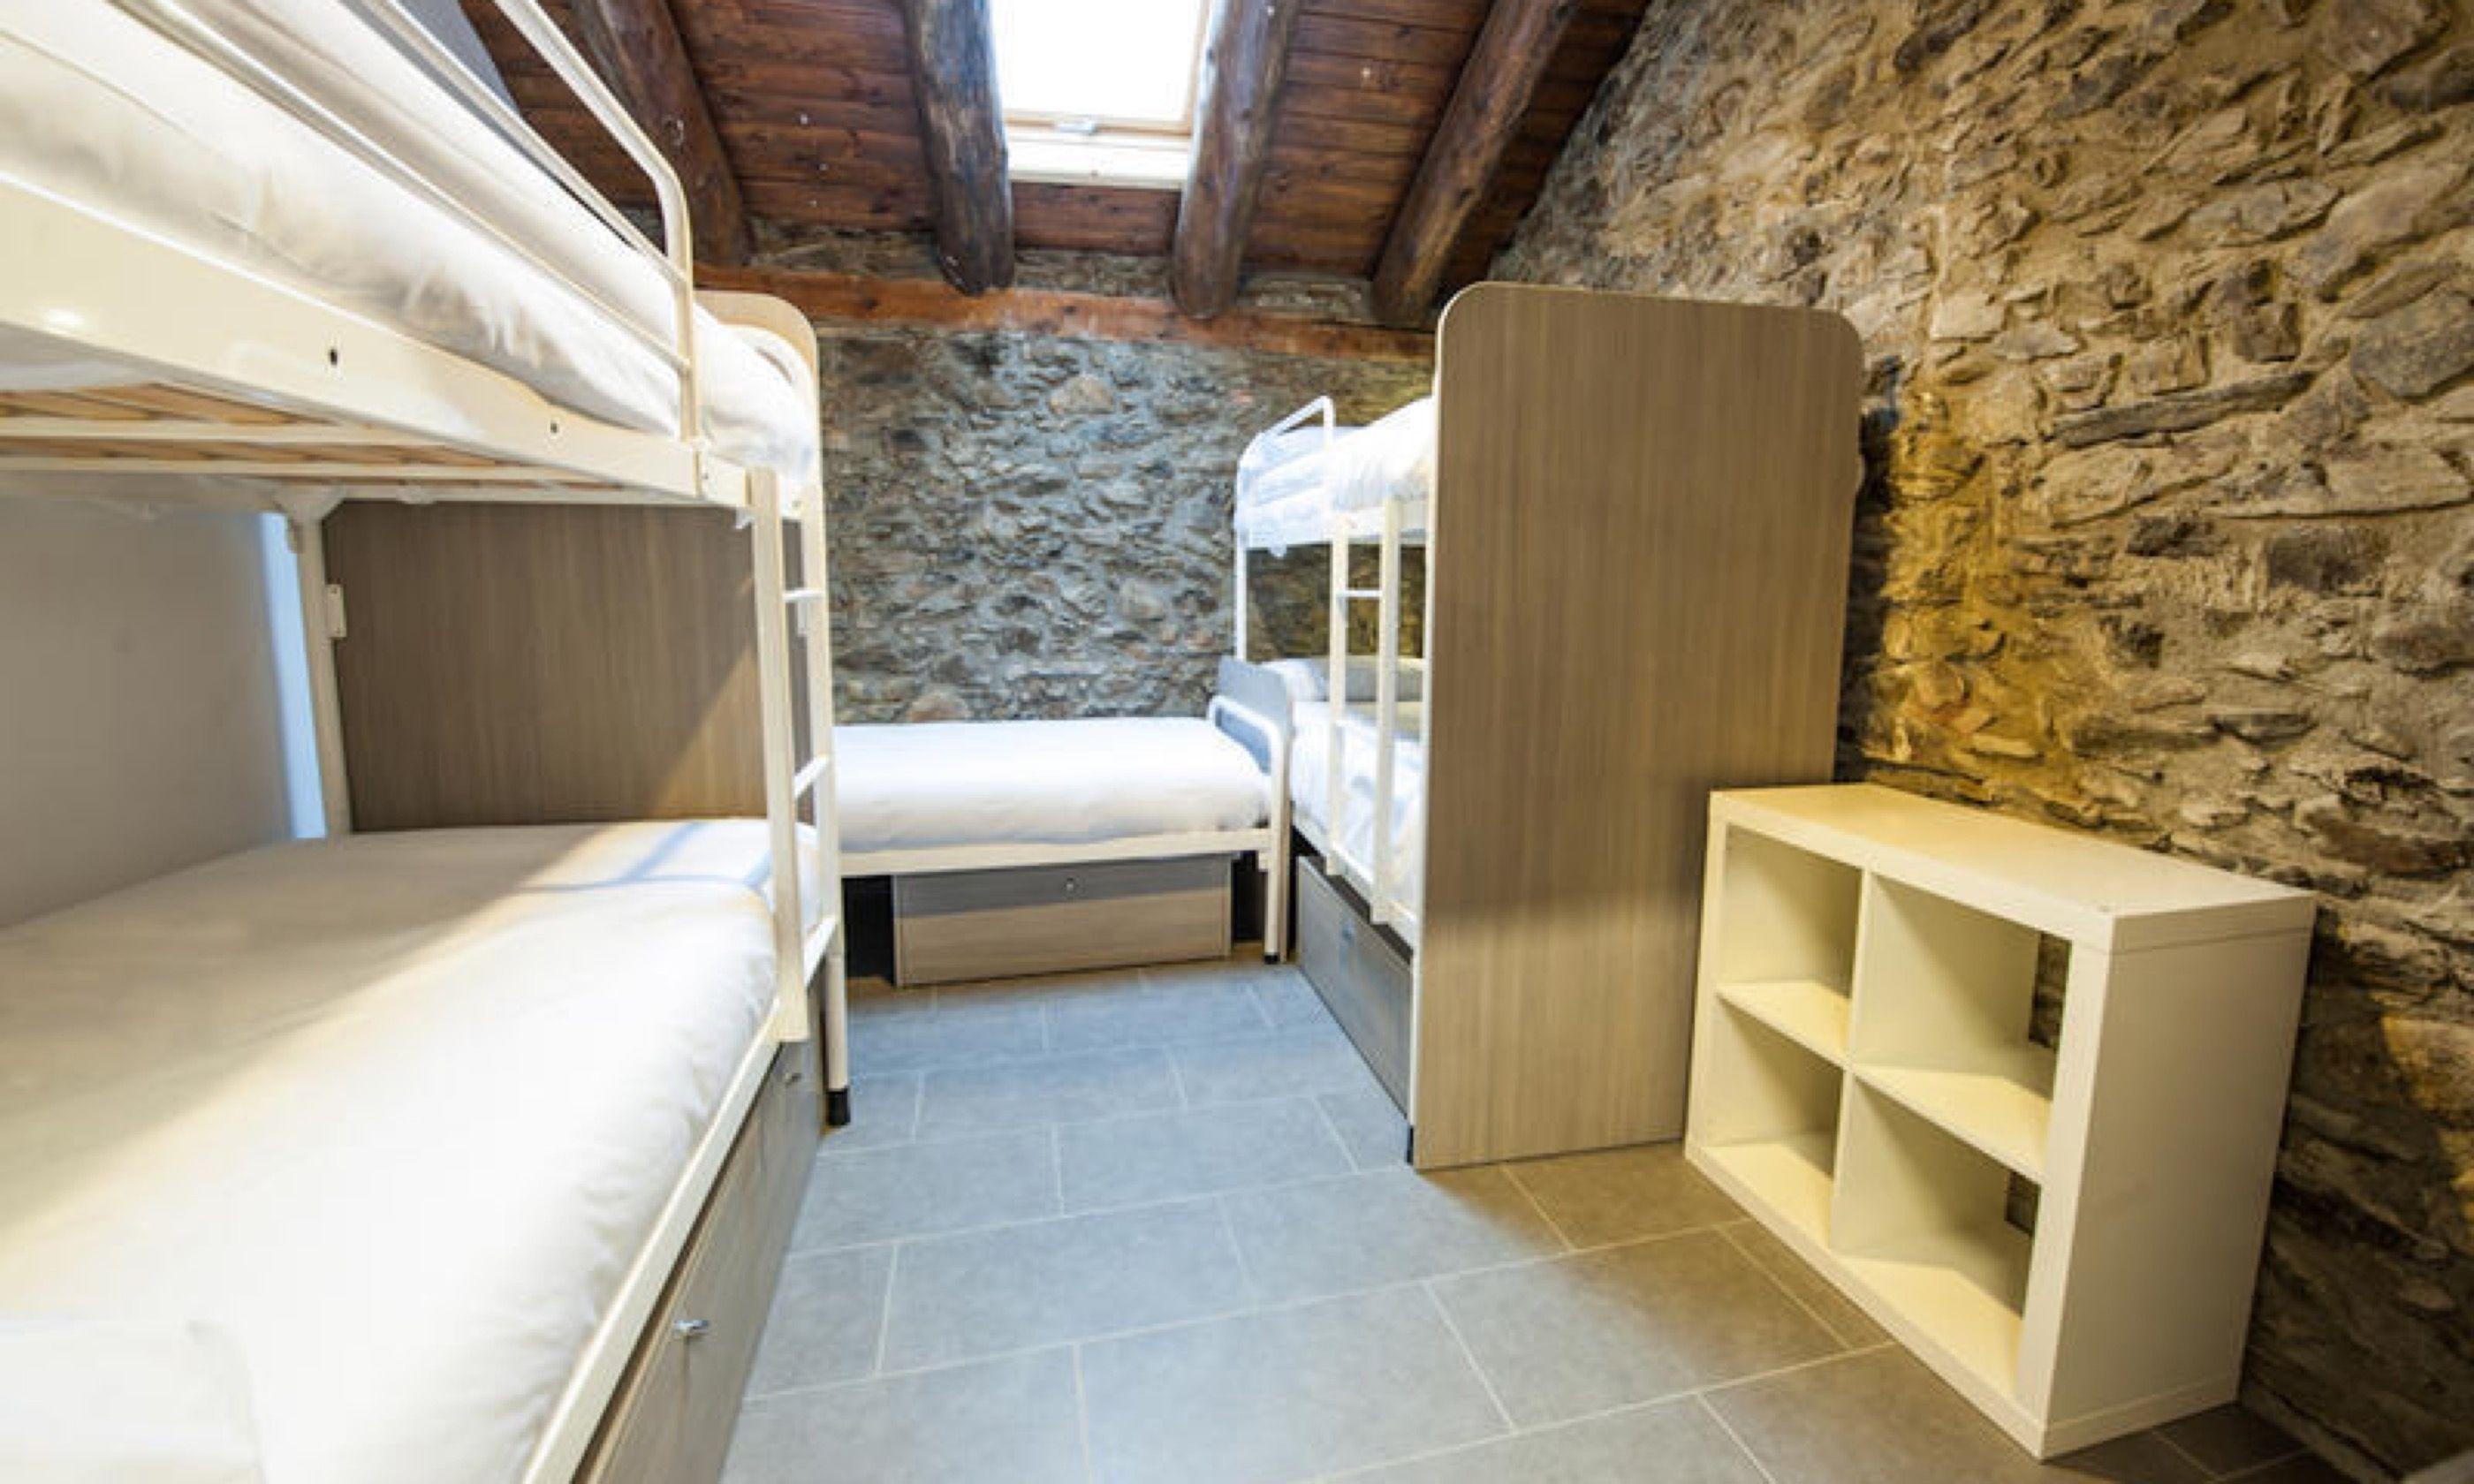 Rustic dorm at Mountain Hostel Tarter (Kash Bhattacharya)